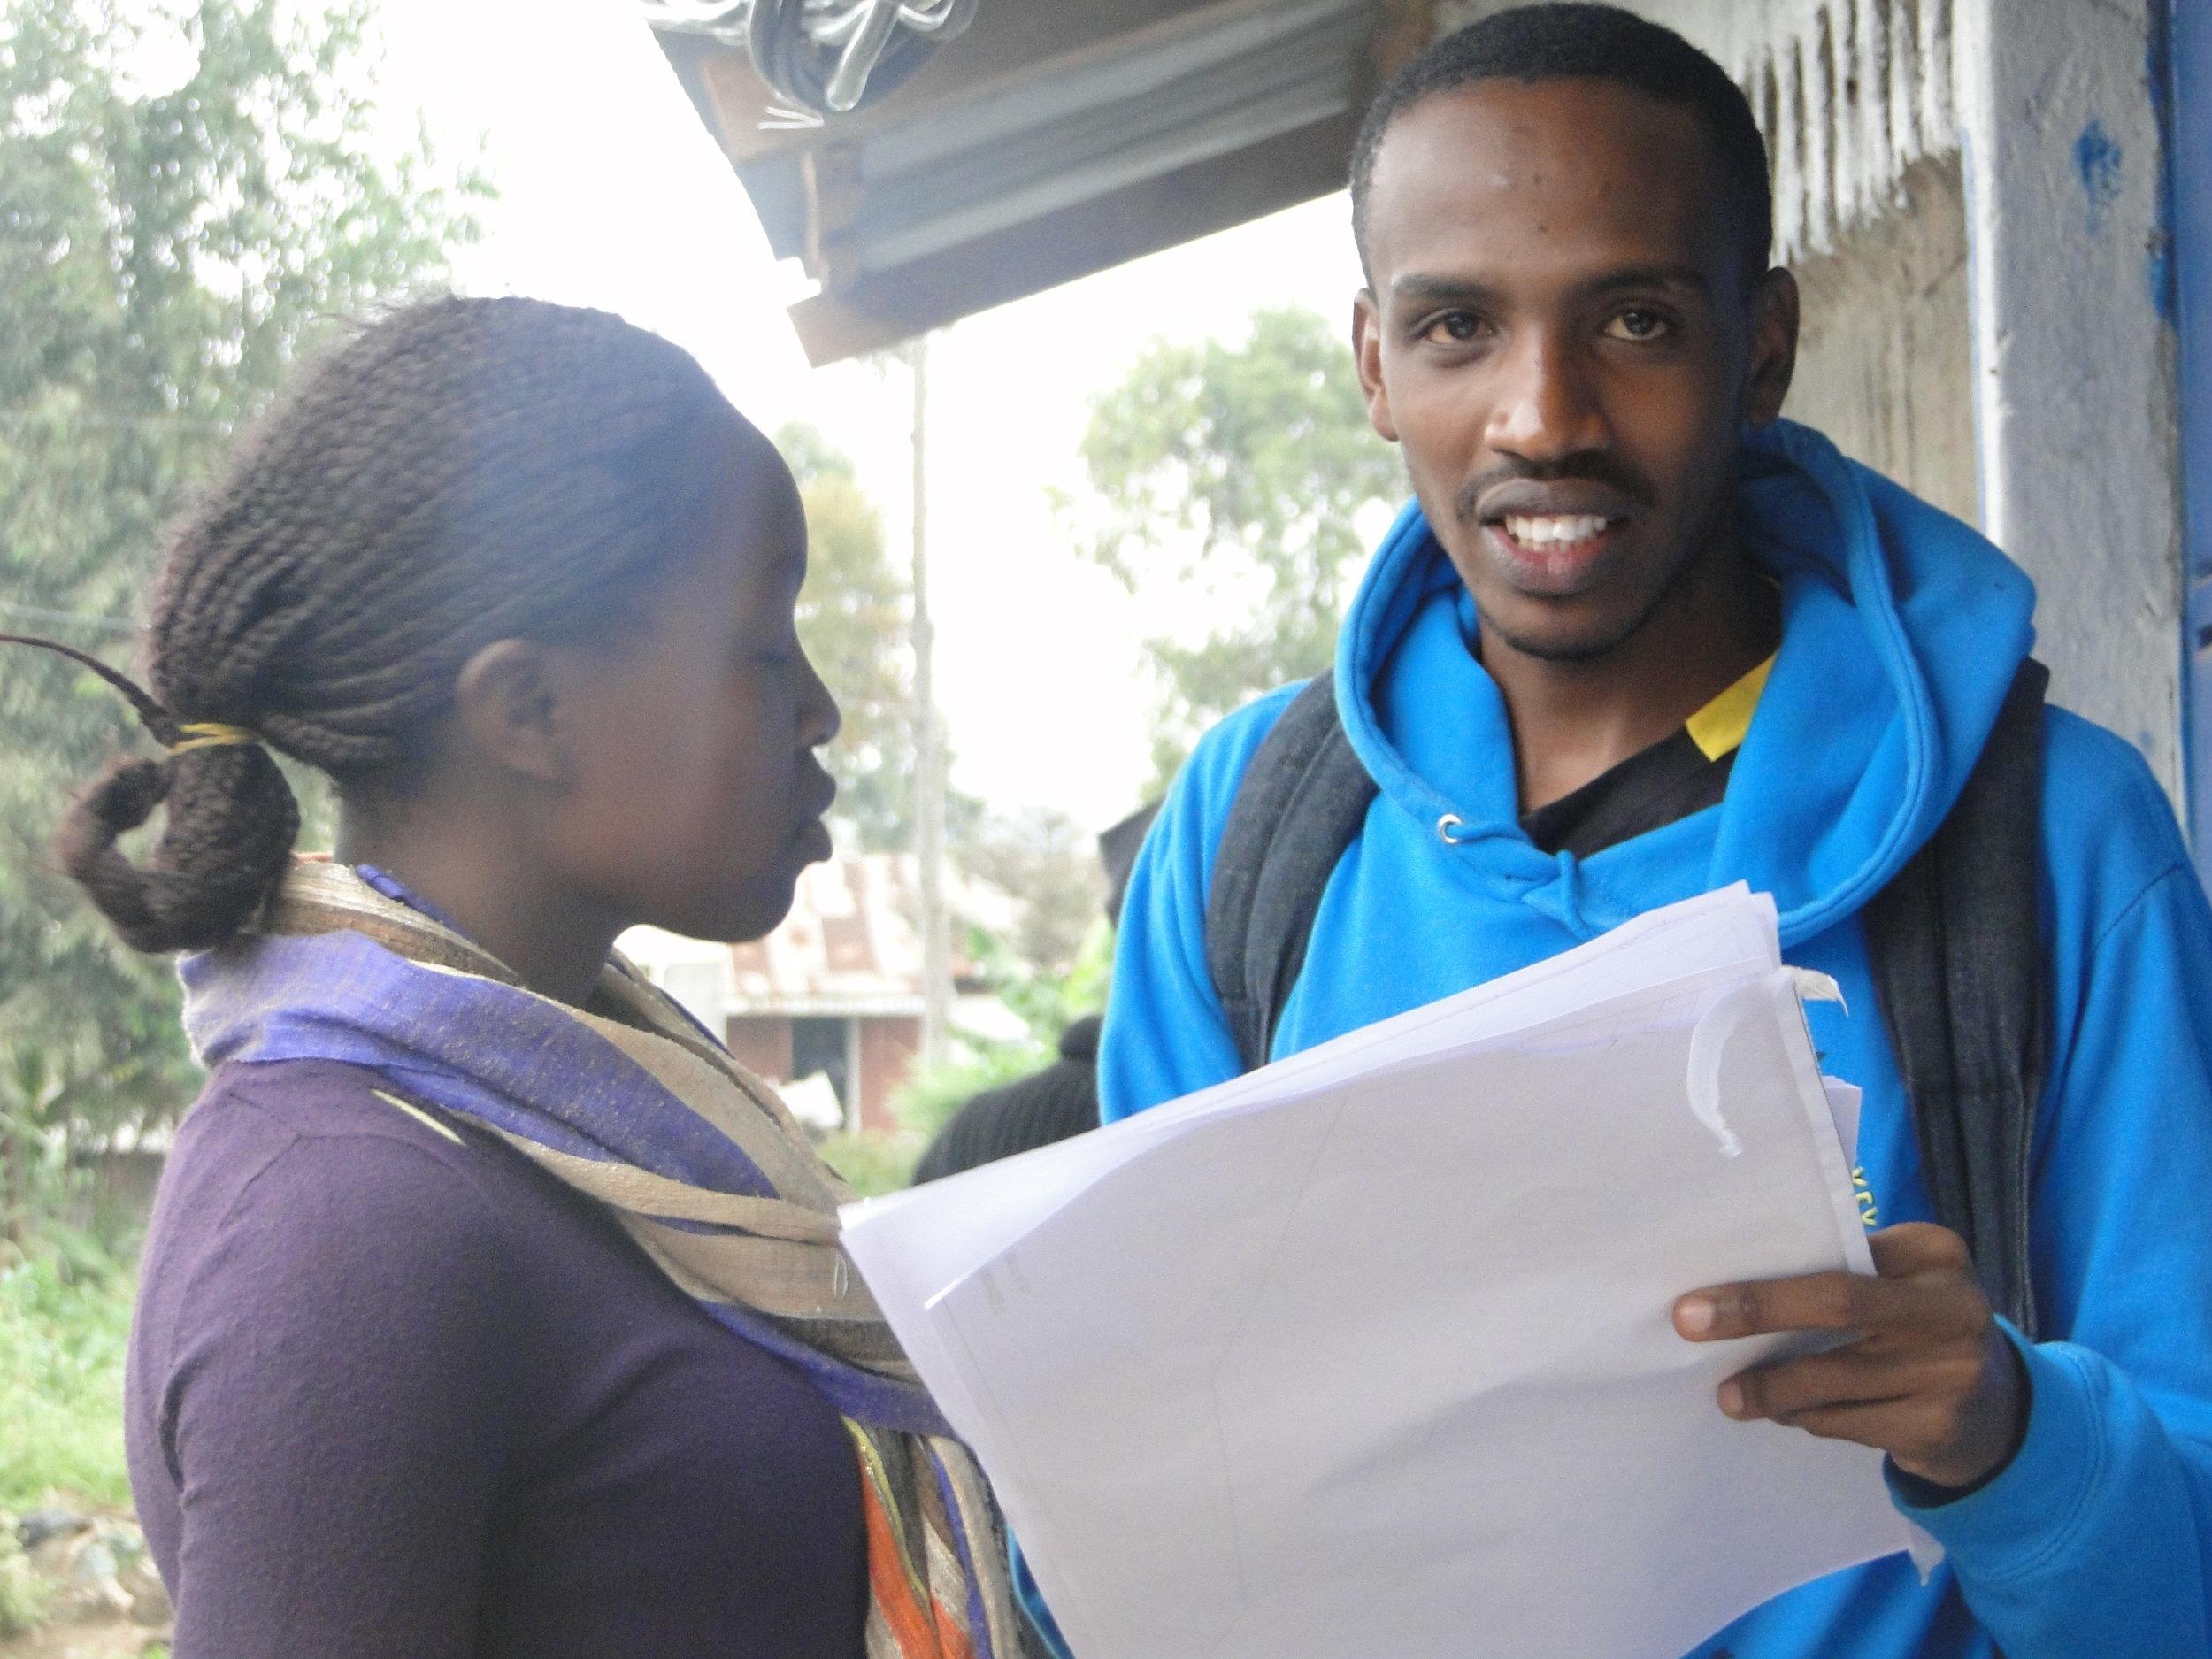 Kelvin supporting a recent settlement profiling in Mukuru Kwa Reuben.